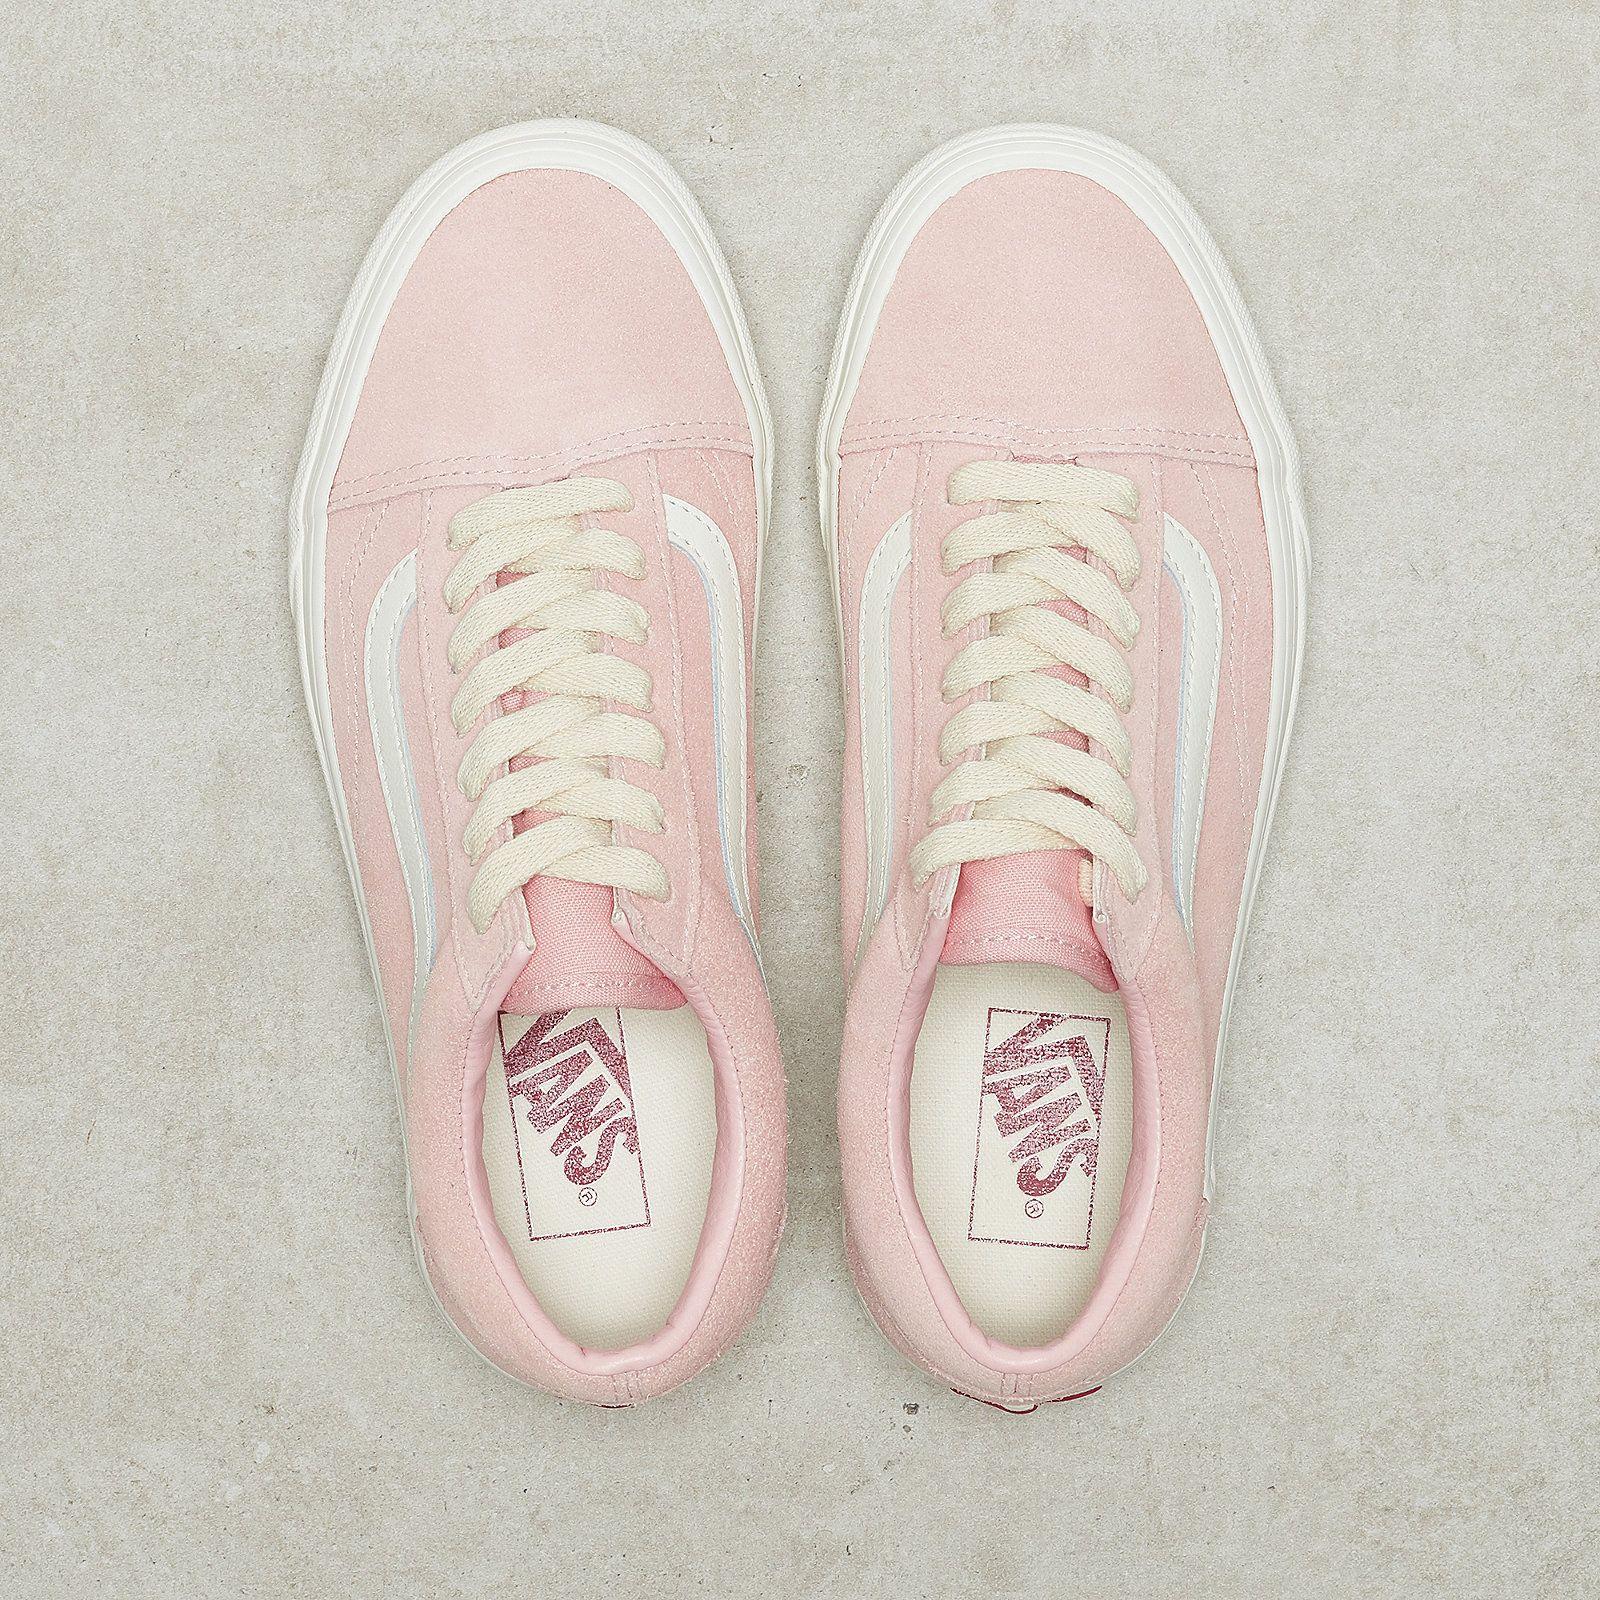 Vans Shoes Old Skool (herringbone laceenglish rosemarshmallow)